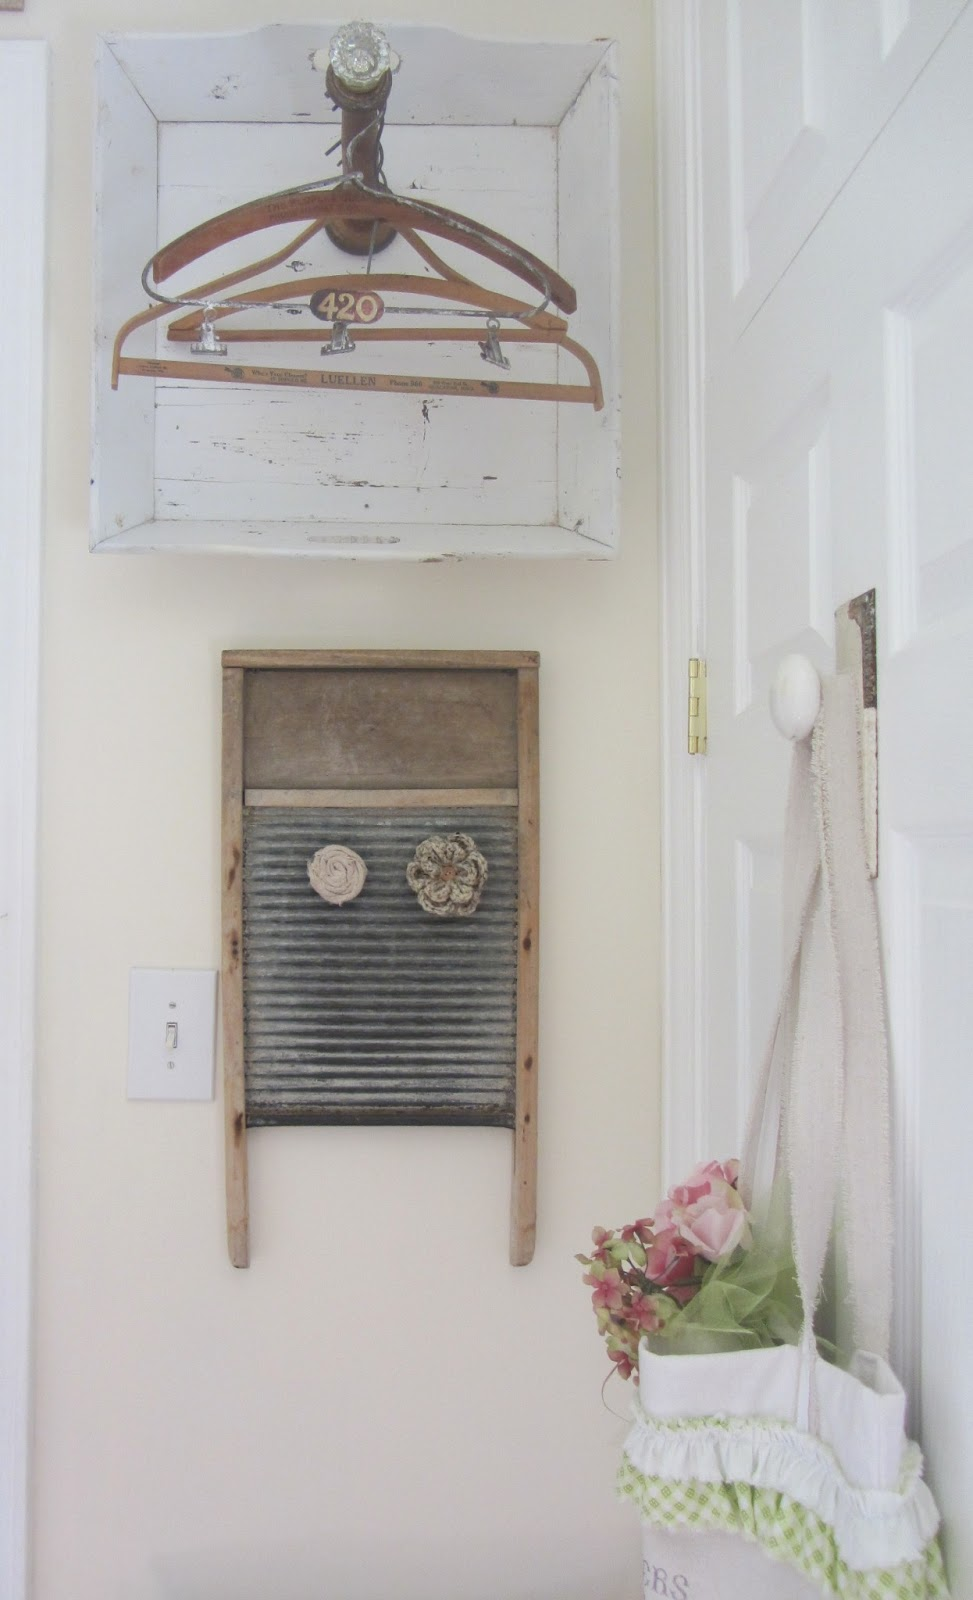 Vintage Laundry Decor Junk Chic Cottage Laundry Room